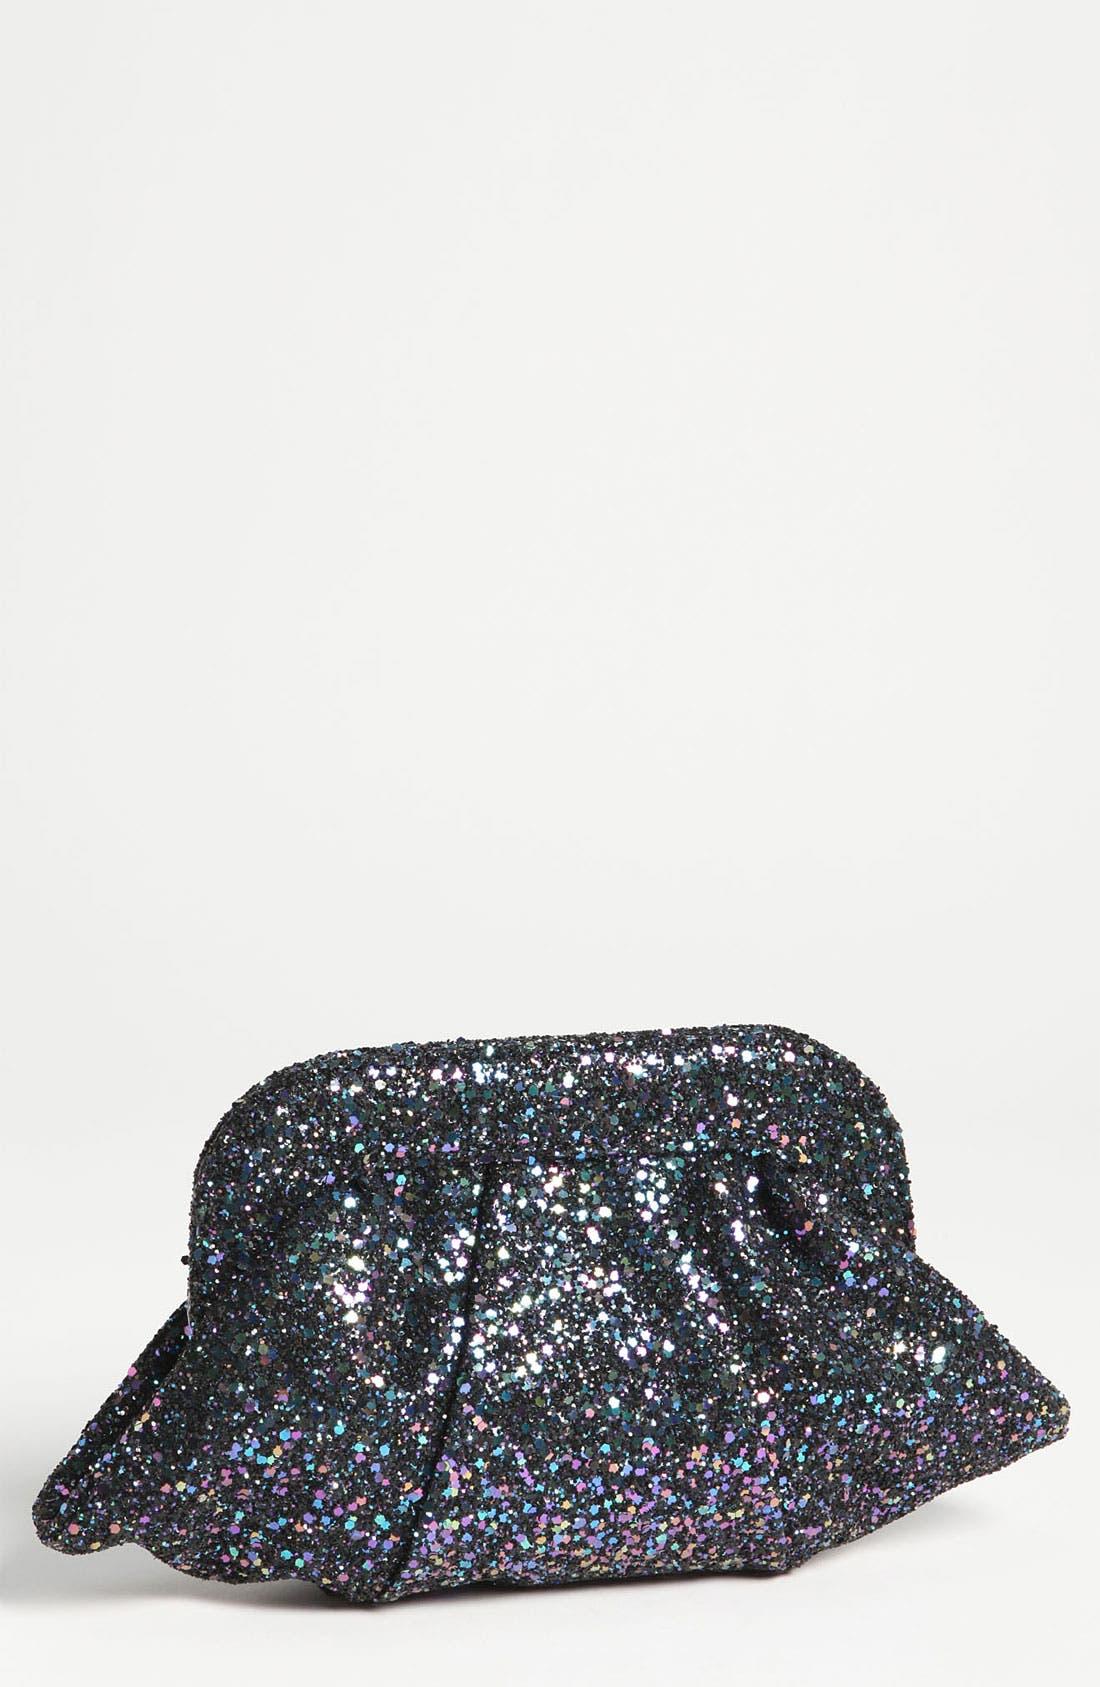 Main Image - Lauren Merkin 'Lucy' Glitter Encrusted Clutch